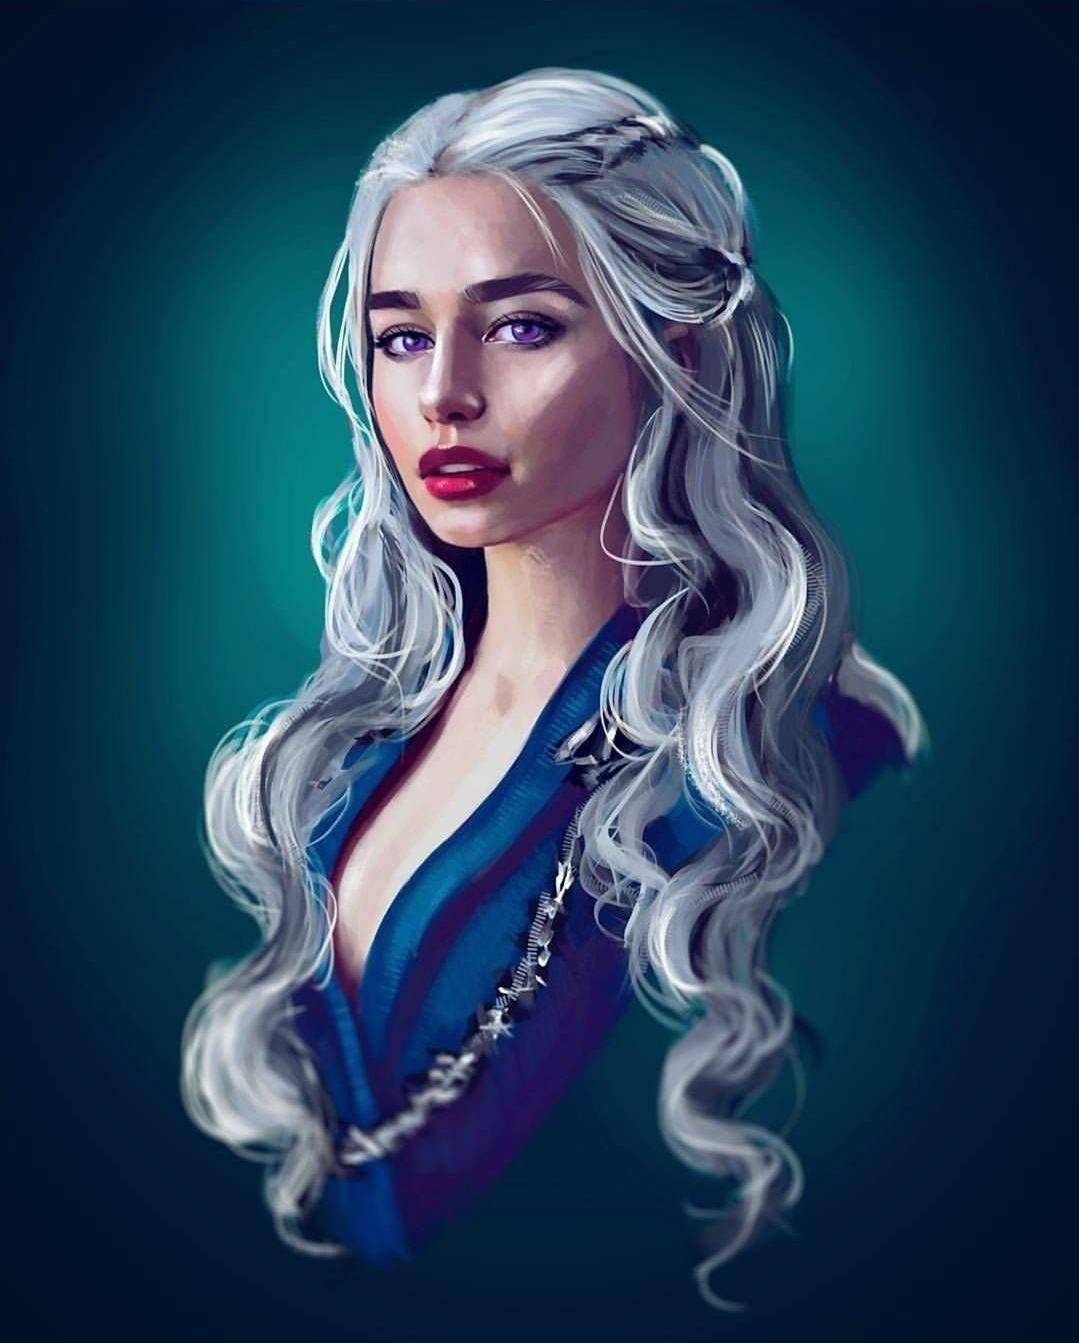 Pin By Abb Machine On Daenerys Targaryen Targaryen Art Daenerys Targaryen Art Art